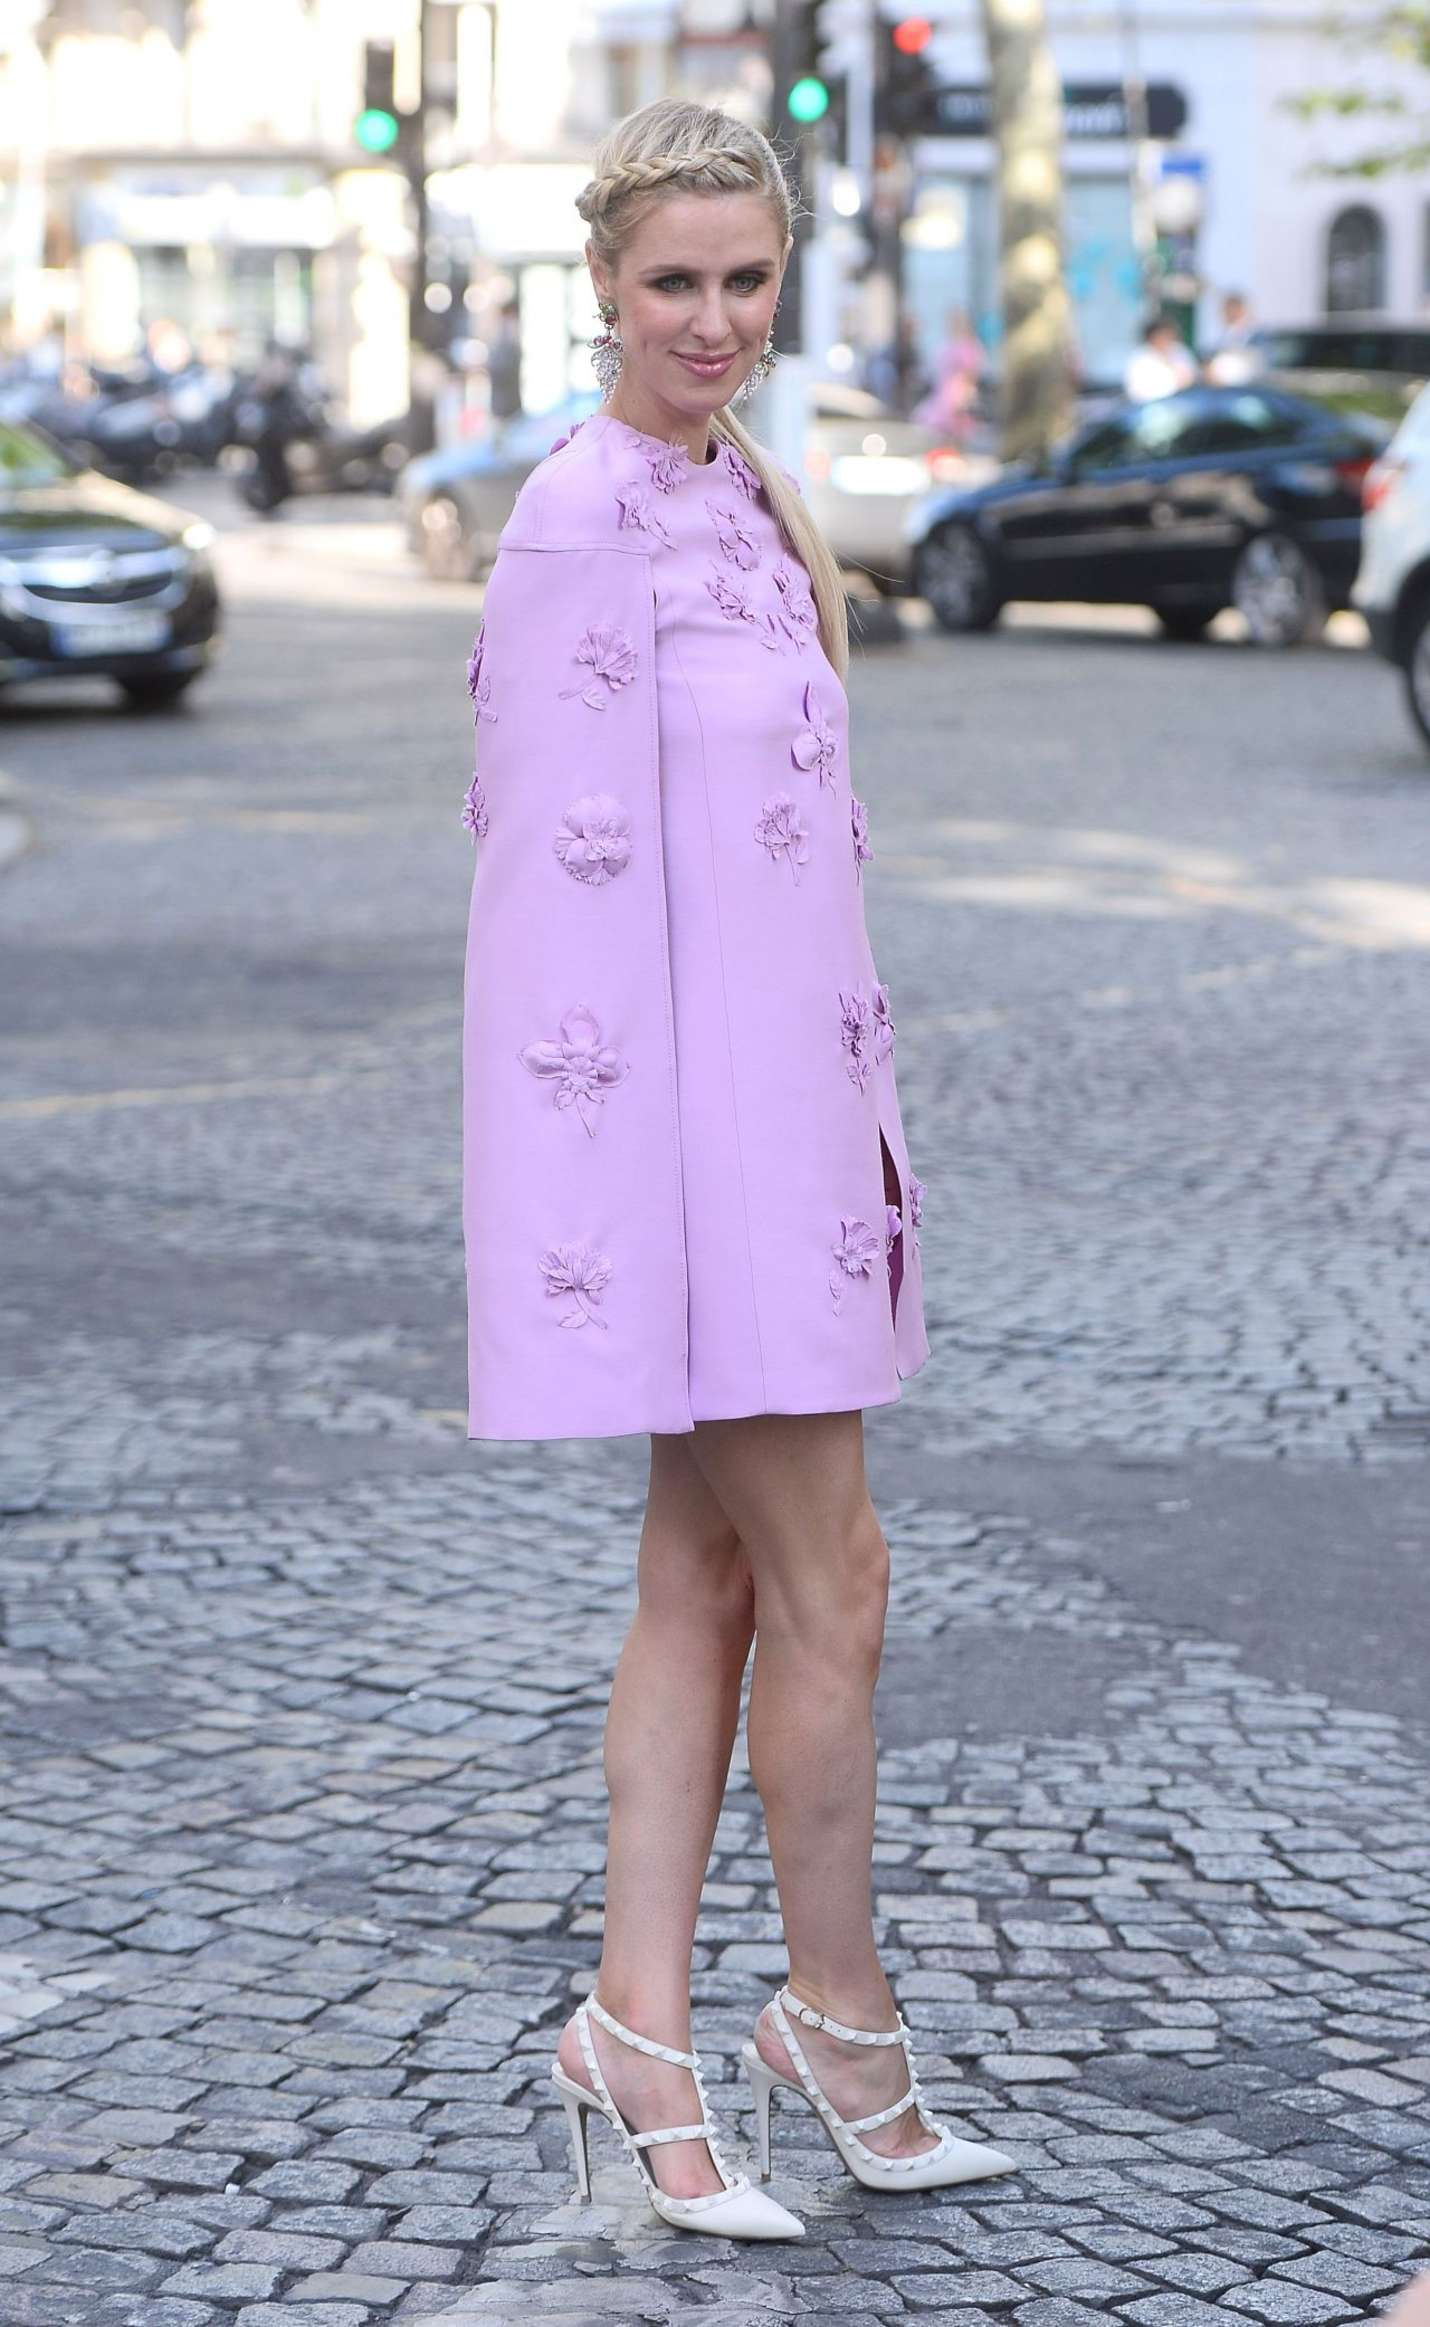 Nicky Hilton 2017 : Nicky Hilton: Leaves the Valentino Fashion Show 2017 -08